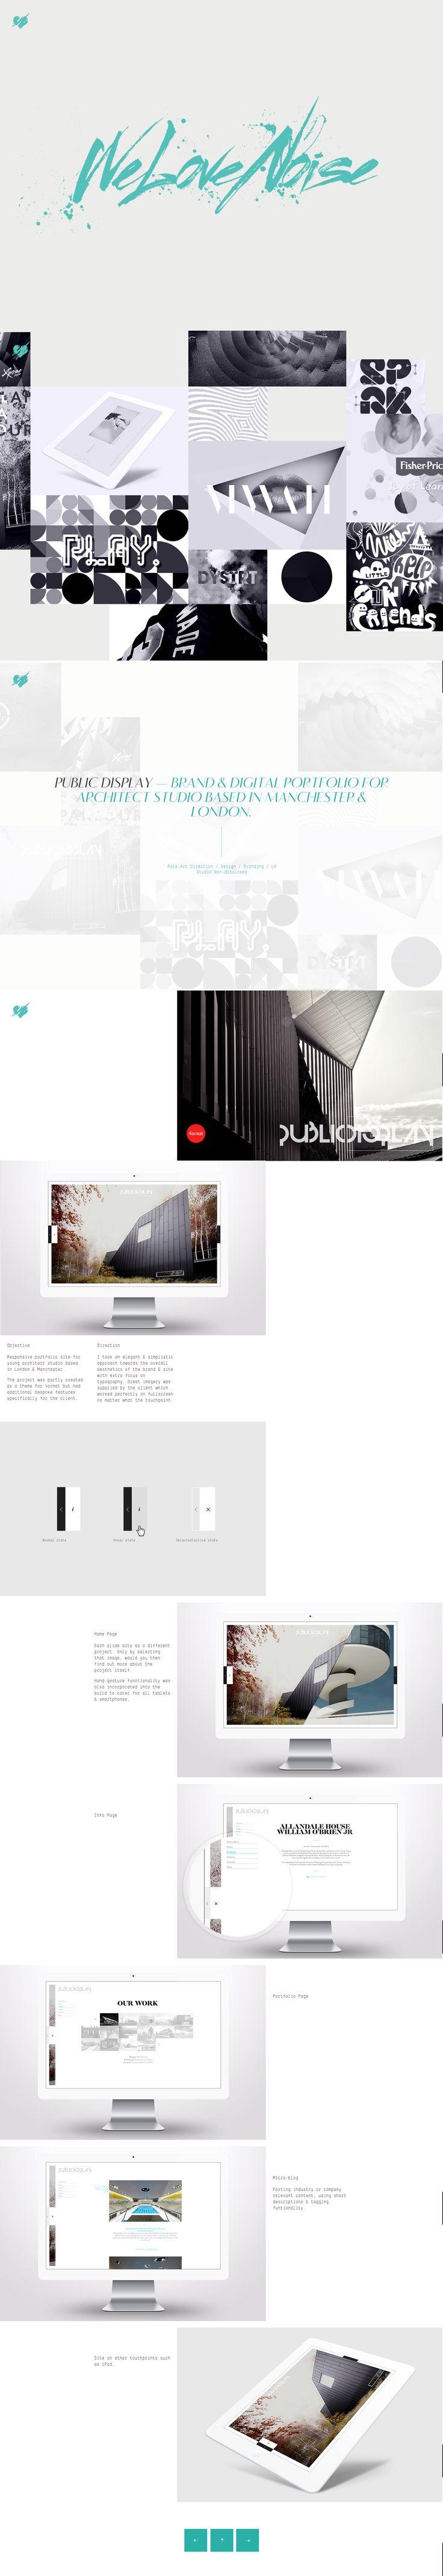 WeLoveNoise  http://www.awwwards.com/web-design-awards/welovenoise #Web #Interactive #Clean #Minimal #Responsive #Design #UnusualNavigation #Portfolio